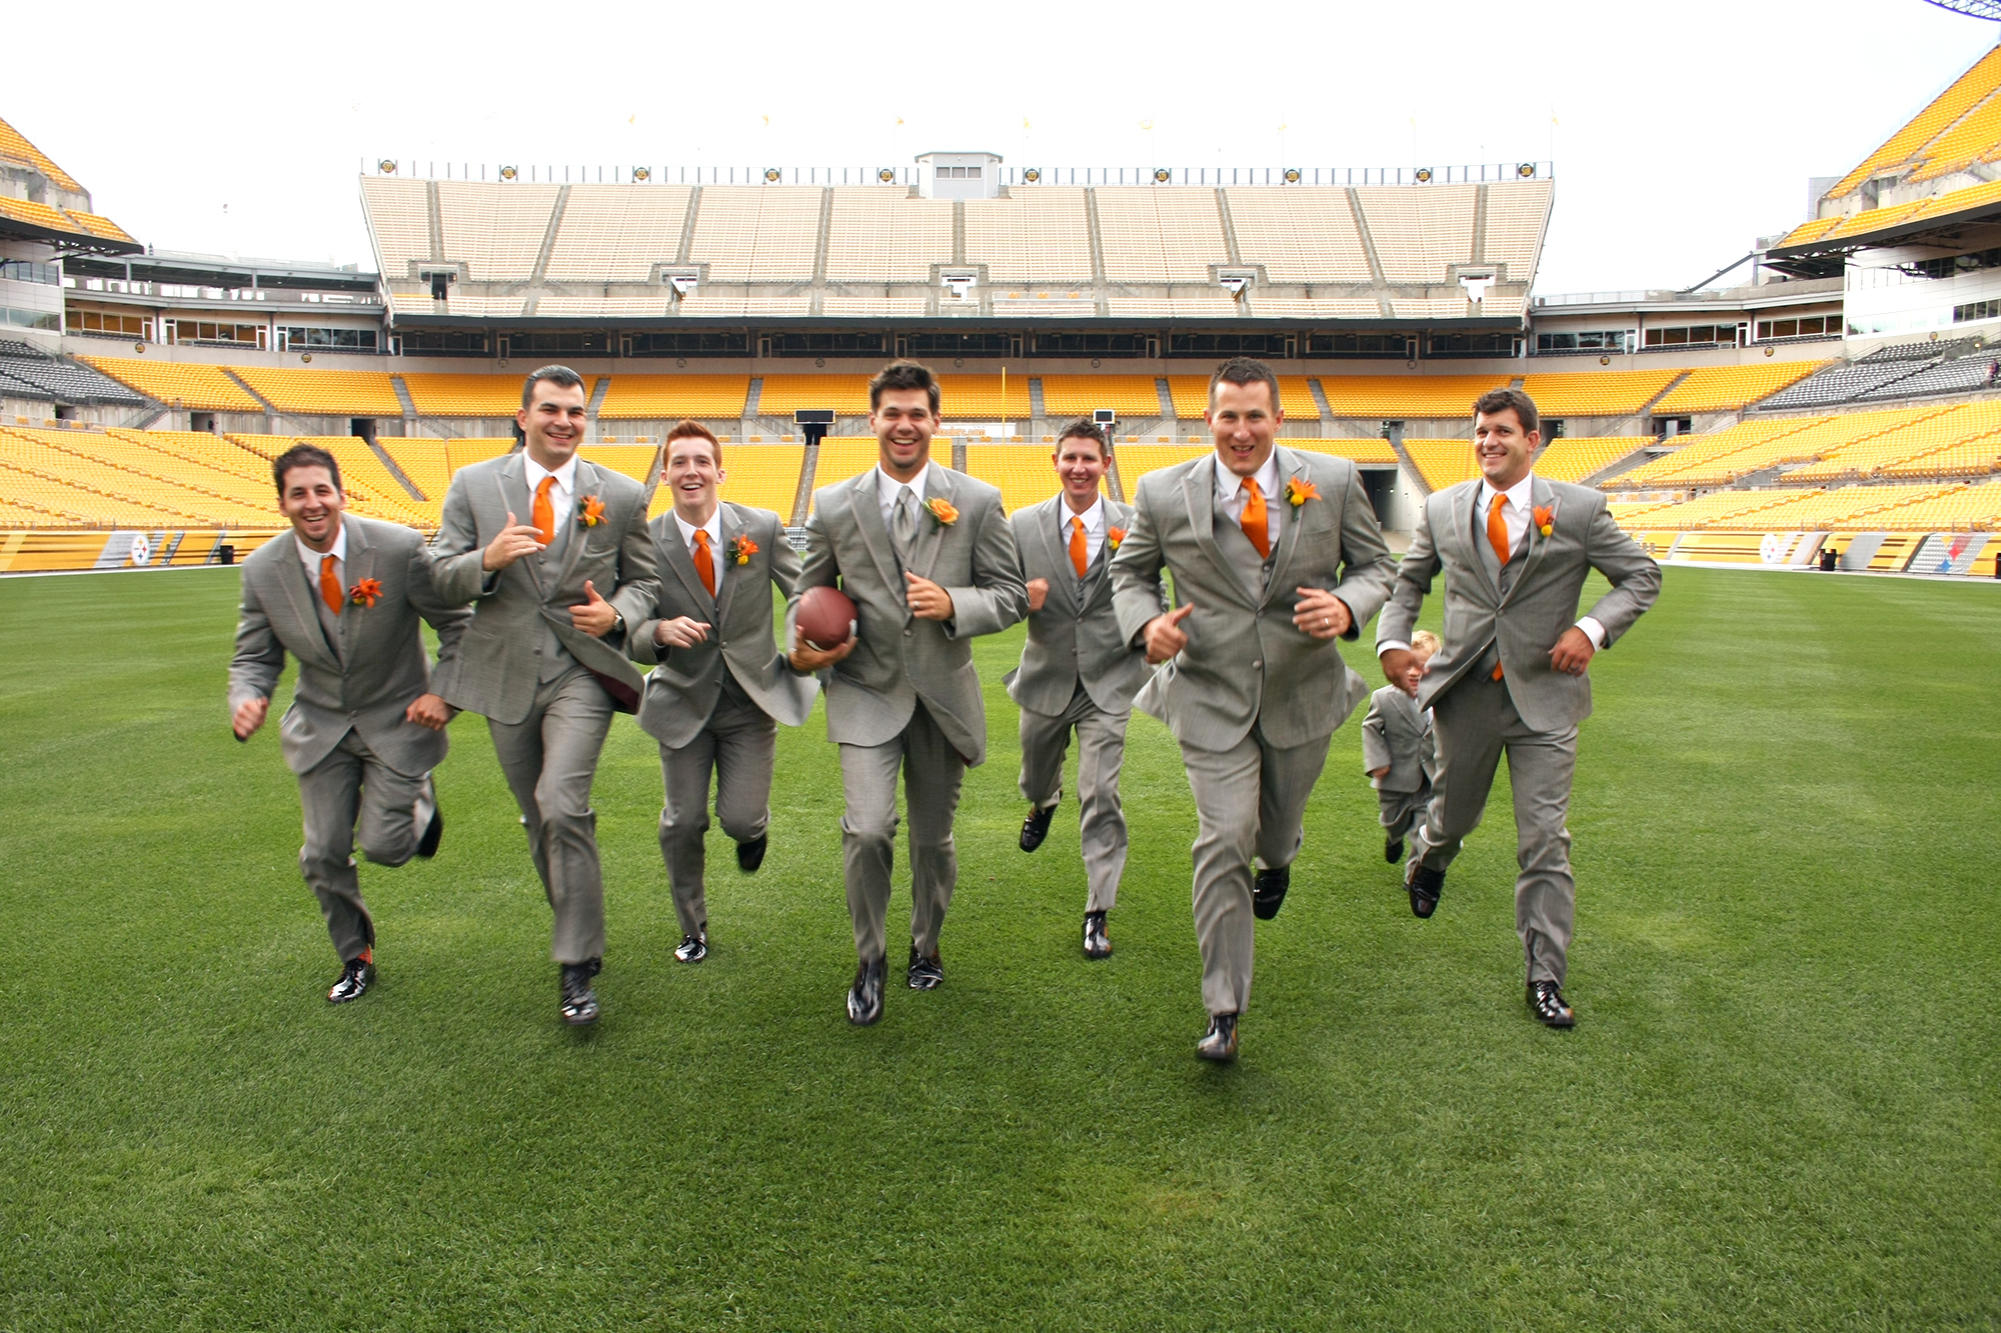 The Groomsmen Ran Down Heinz Field In Pittsburgh Pa